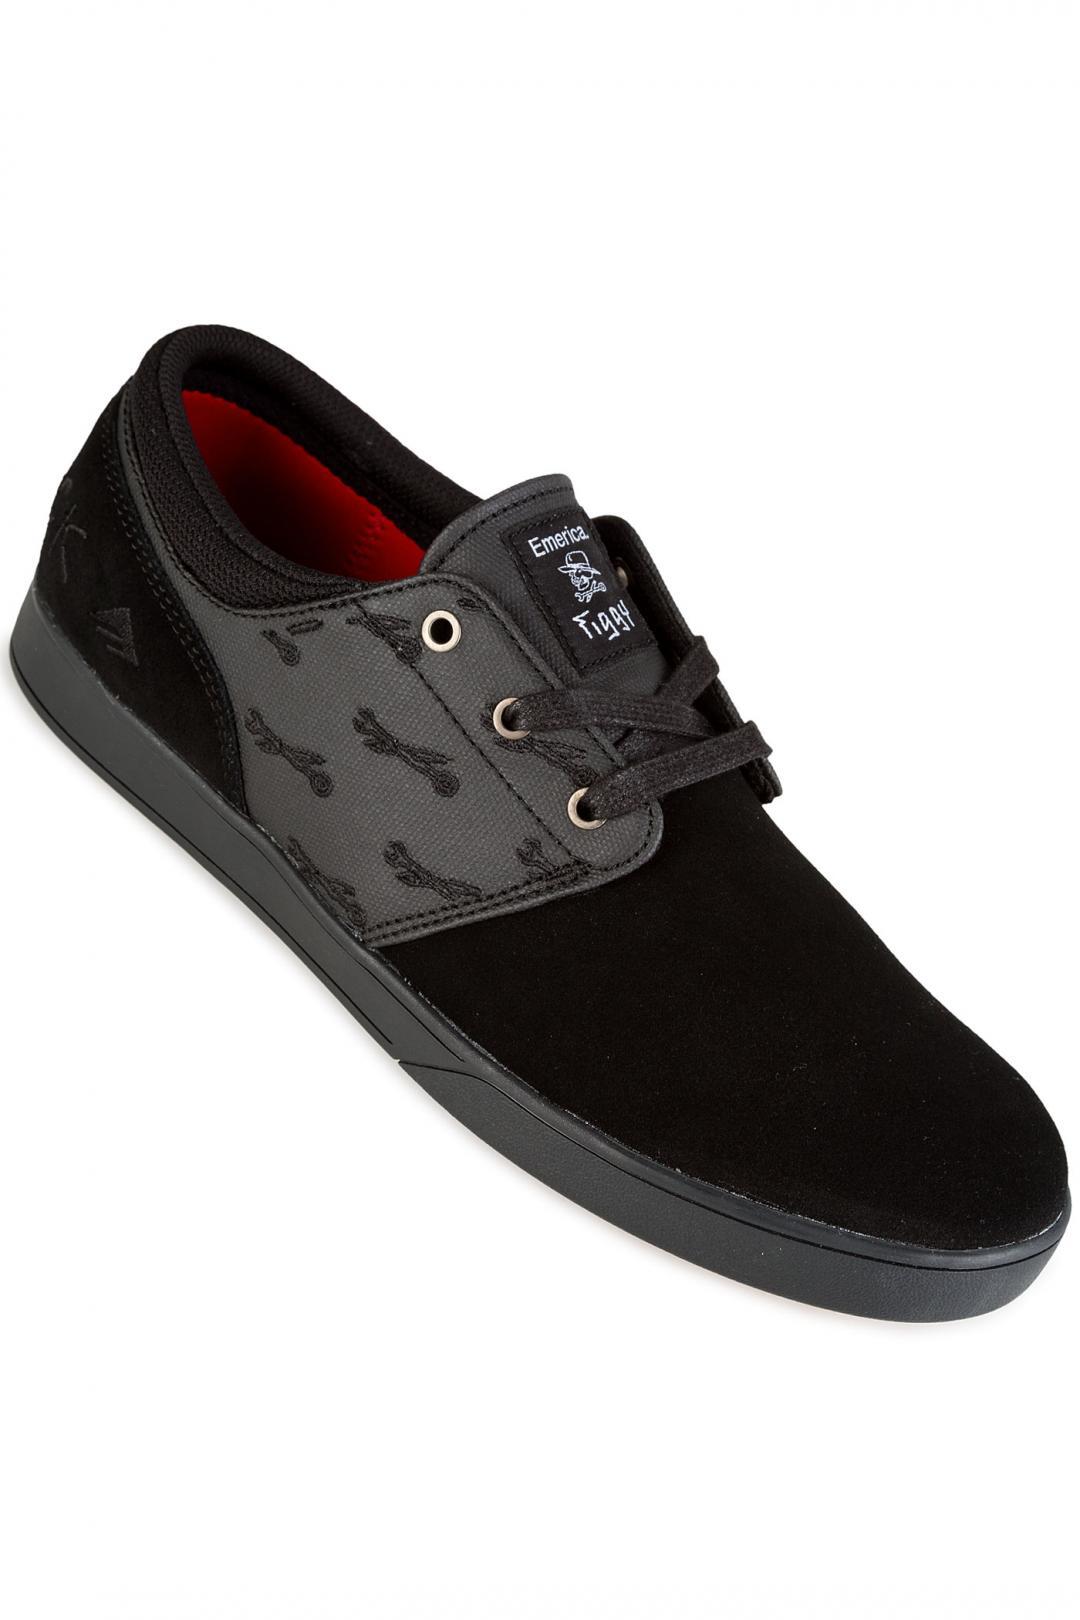 Uomo Emerica x Hard Luck Figueroa black black | Sneakers low top